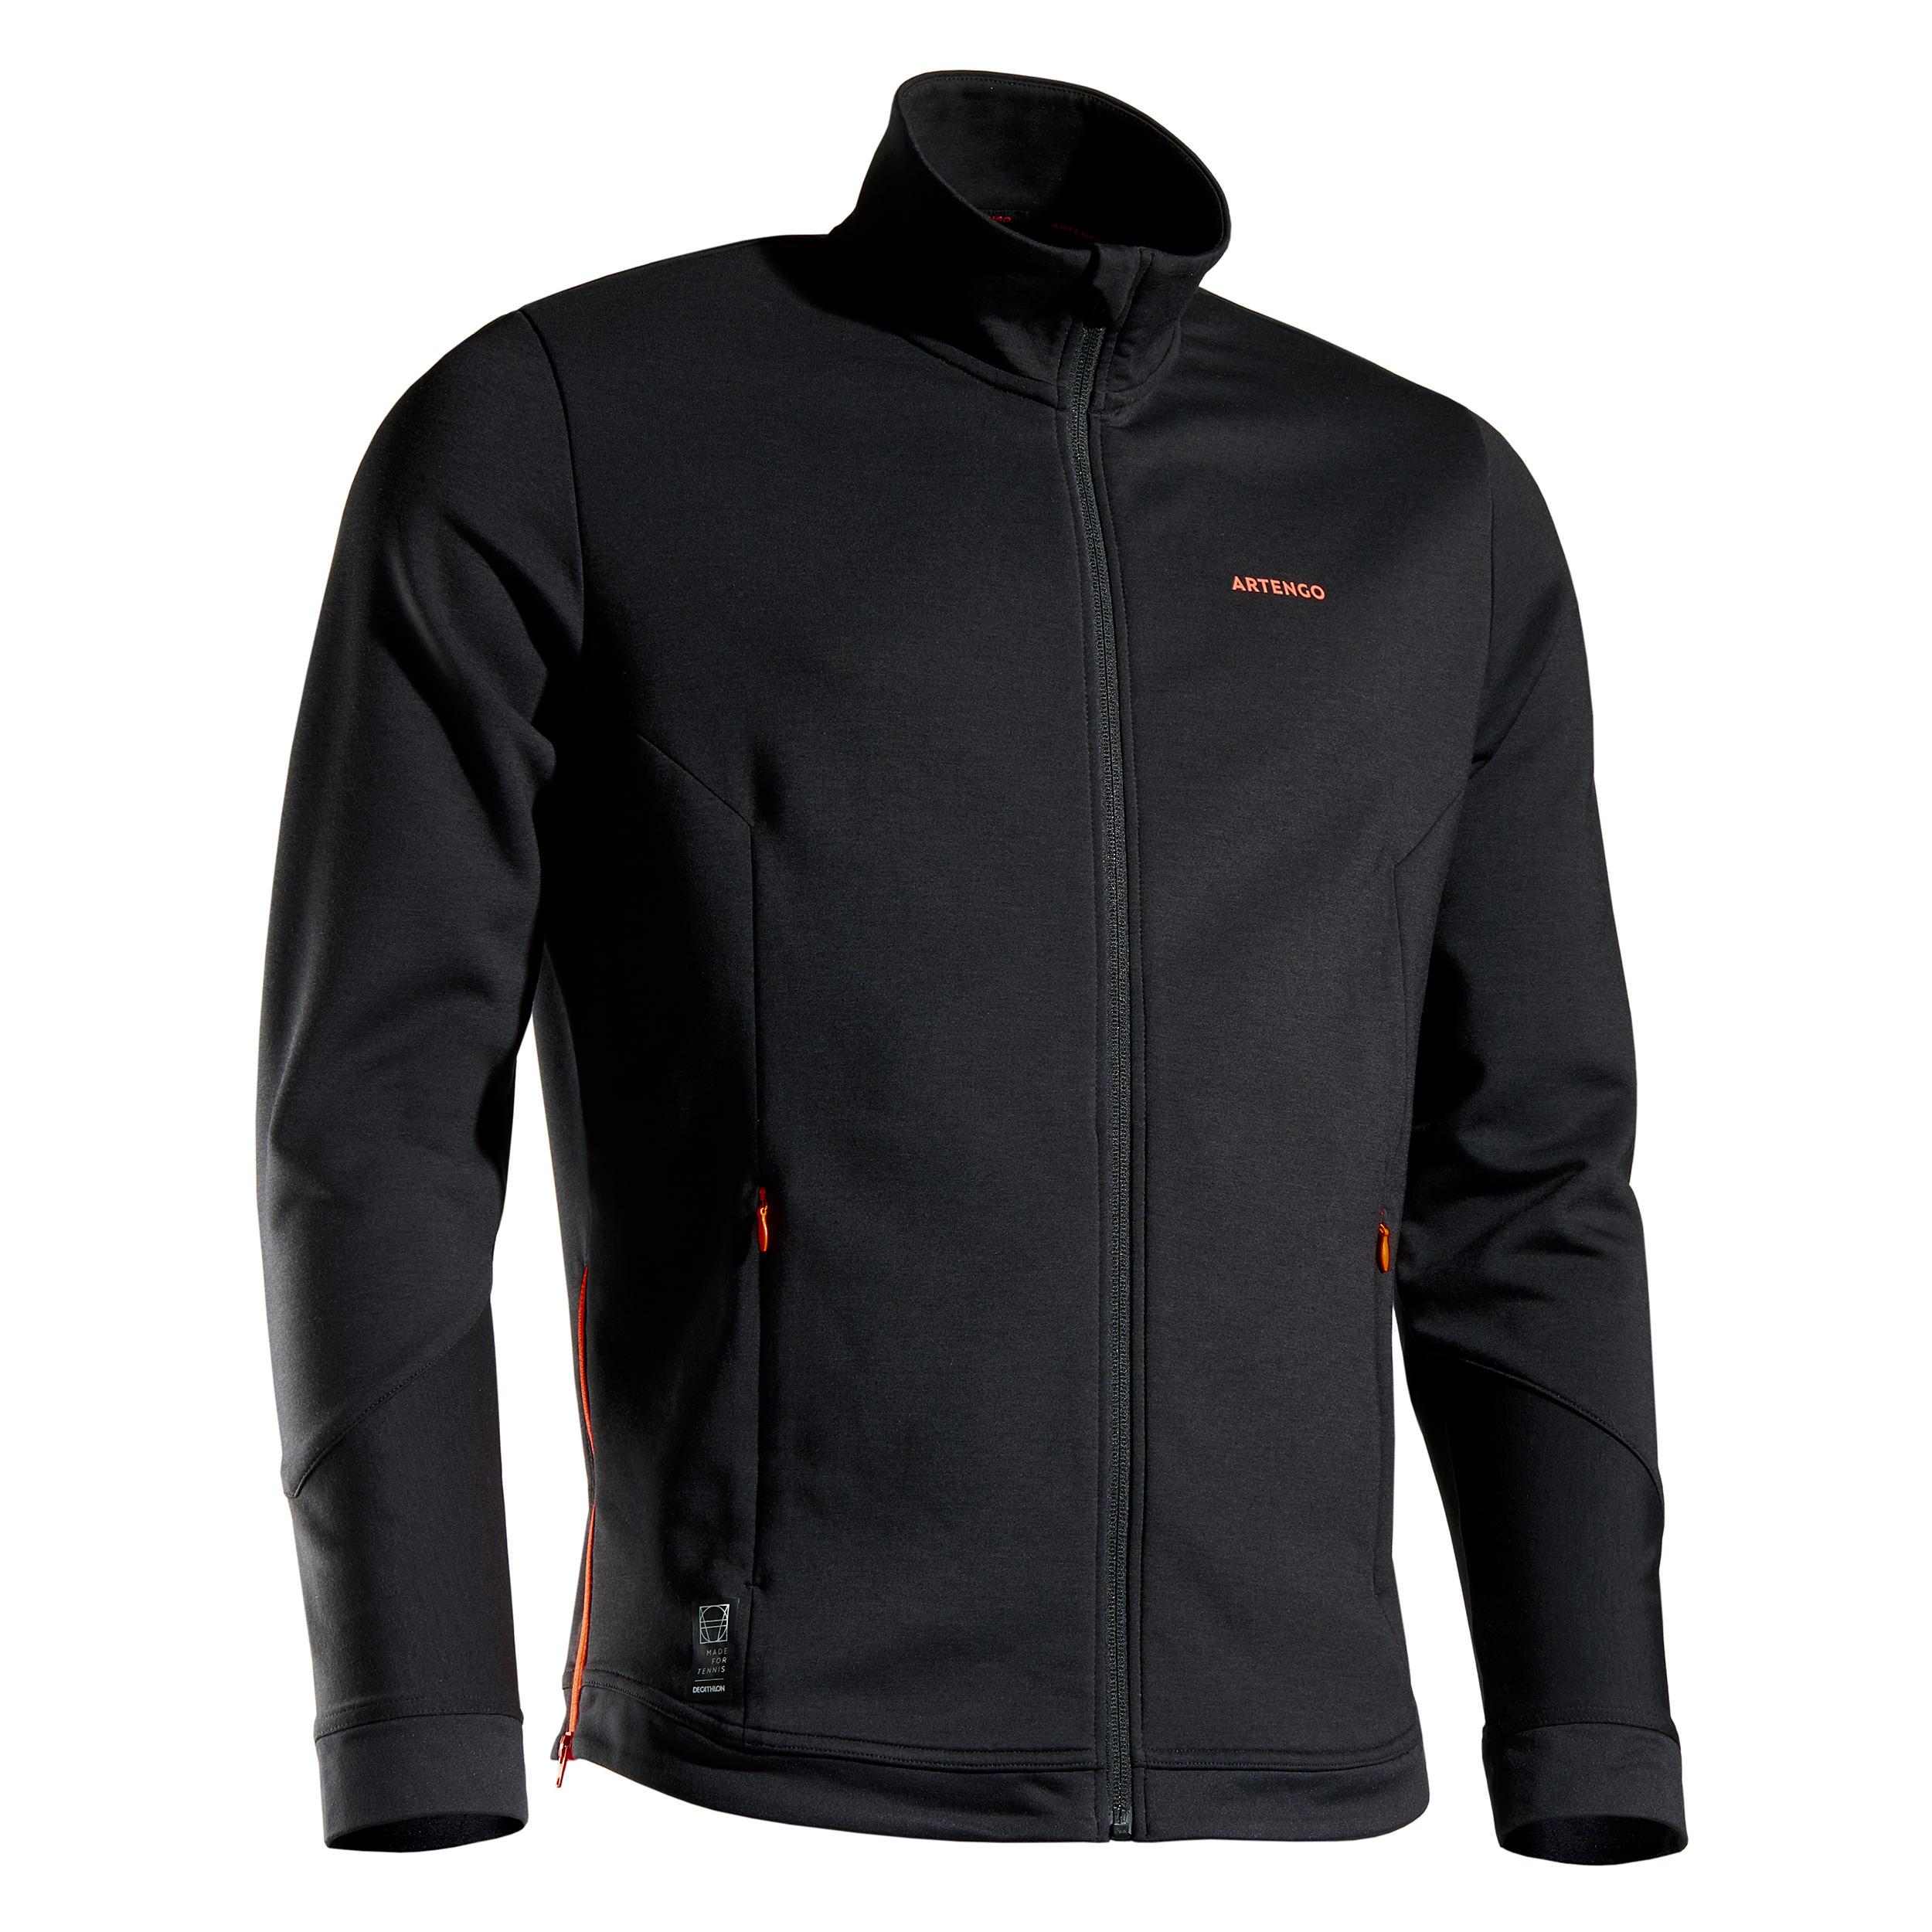 Tennis Trainingsjacke TJA 900 Herren schwarz | Sportbekleidung > Sportjacken > Trainingsjacken | Artengo